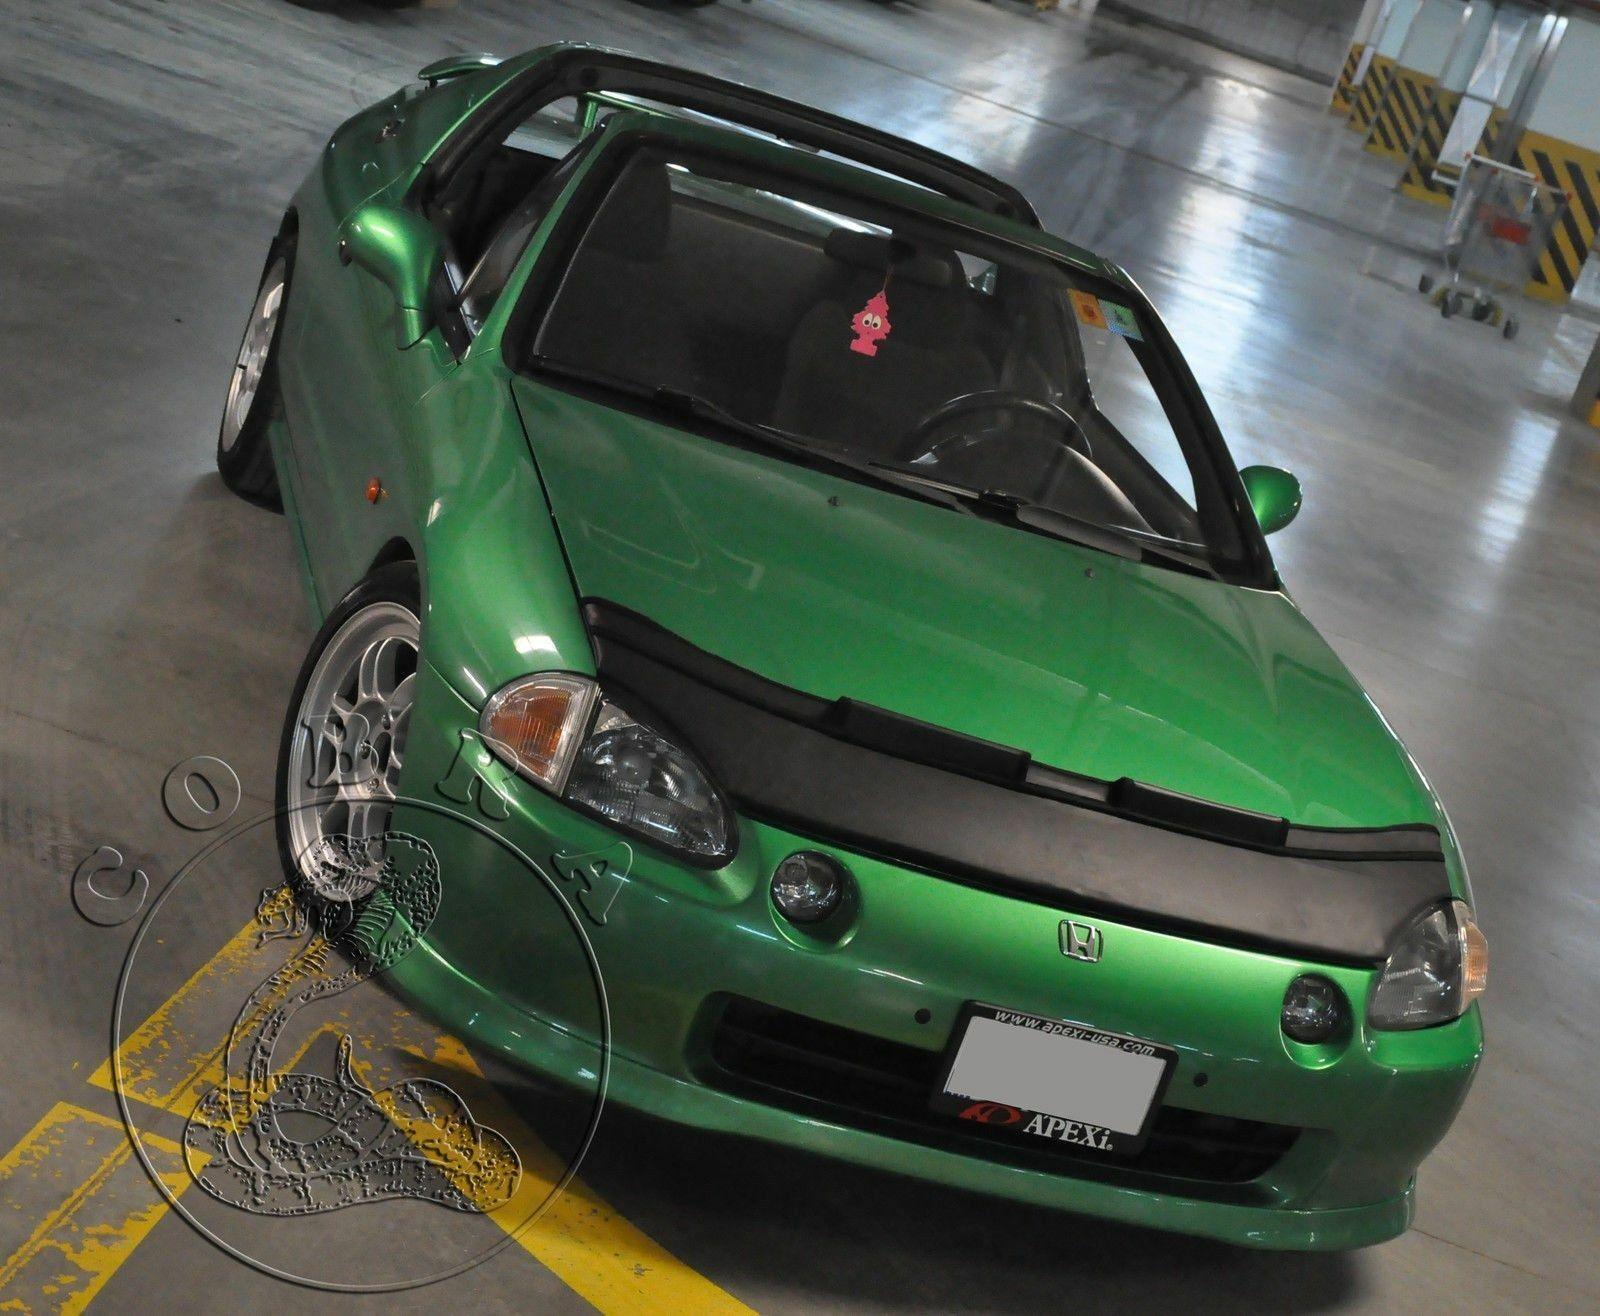 Car Bonnet Hood Bra LOGO Fits Honda Prelude 92 93 94 95 1992 1993 1994 1995